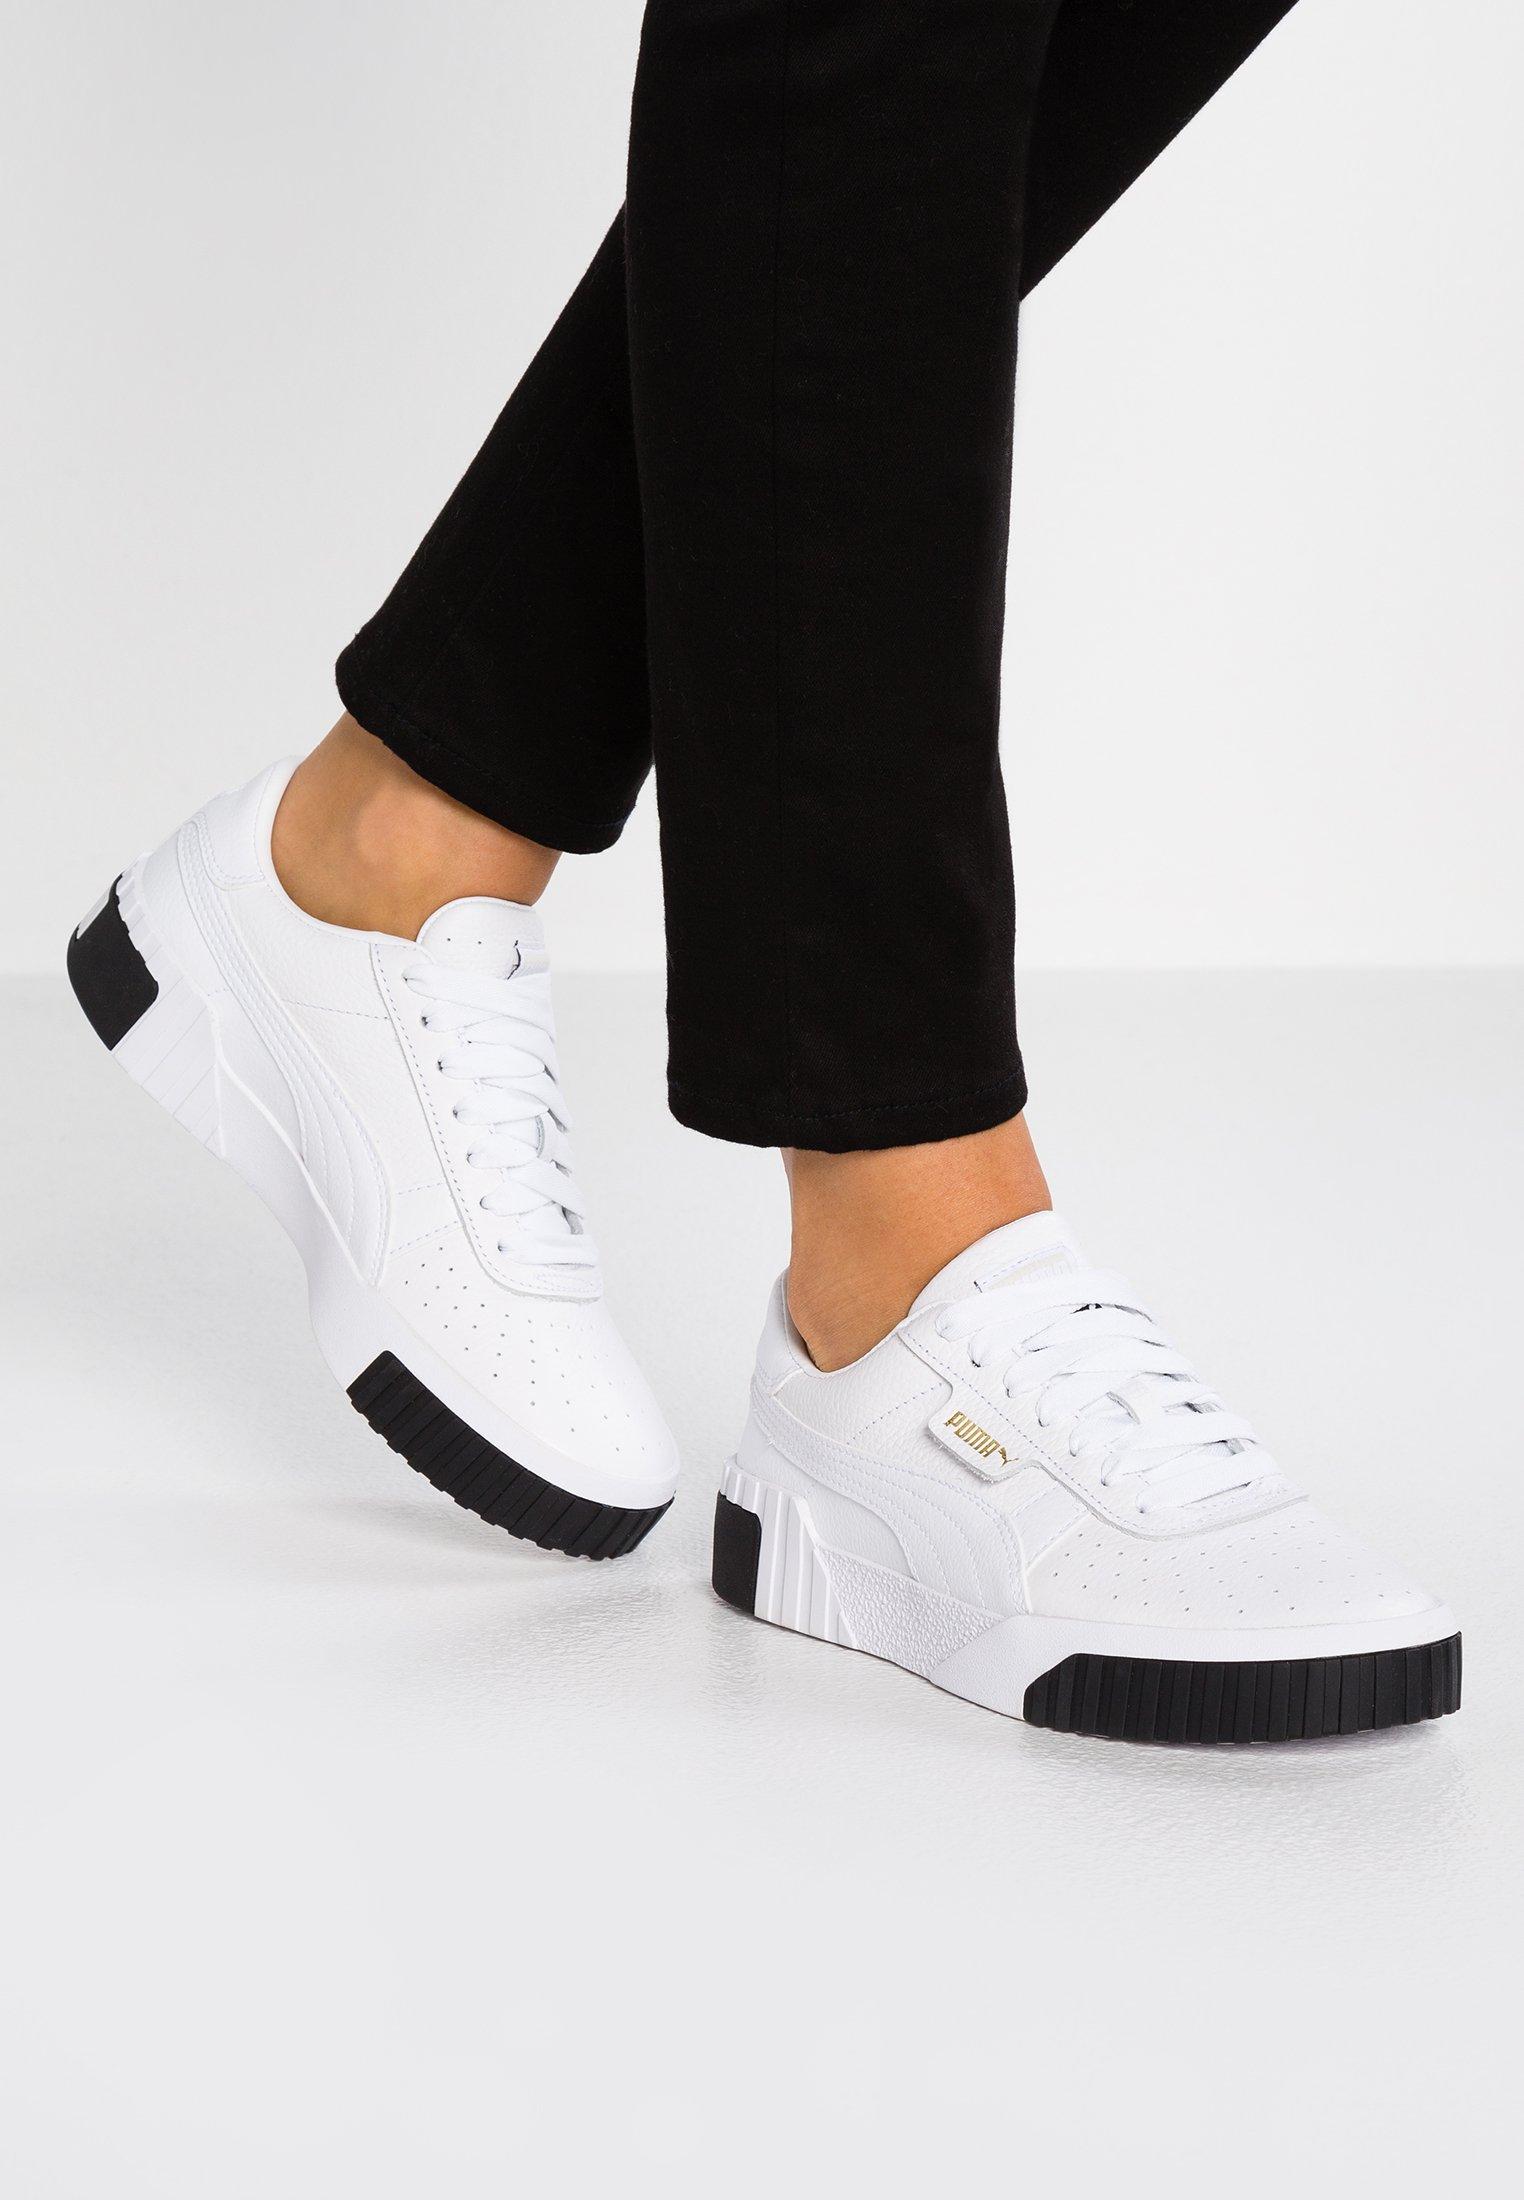 Femme CALI - Baskets basses - white/black